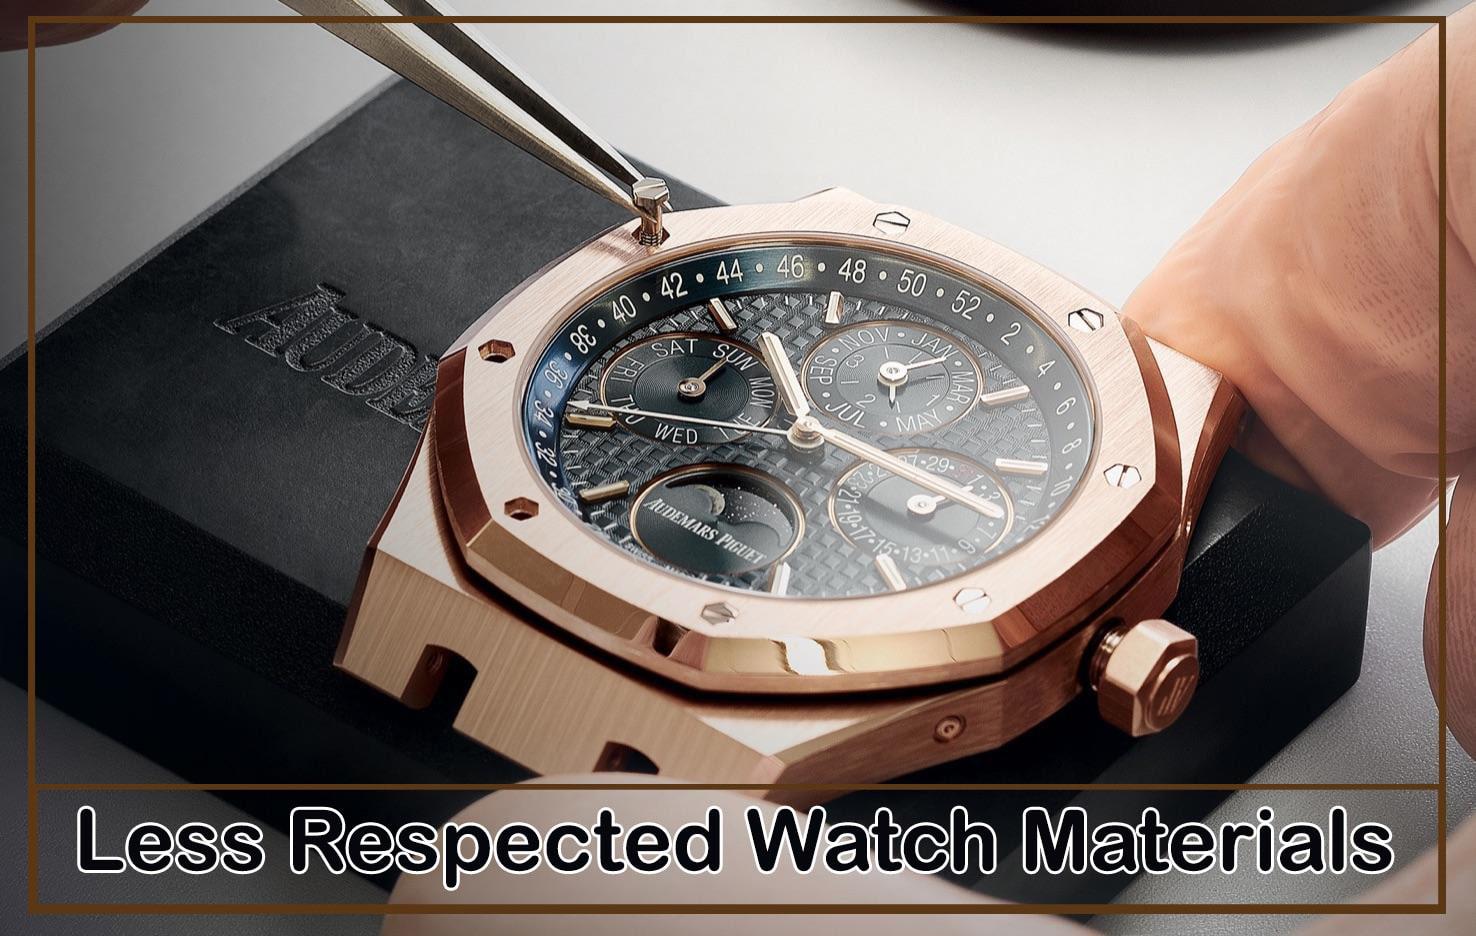 Less Respected Watch Materials